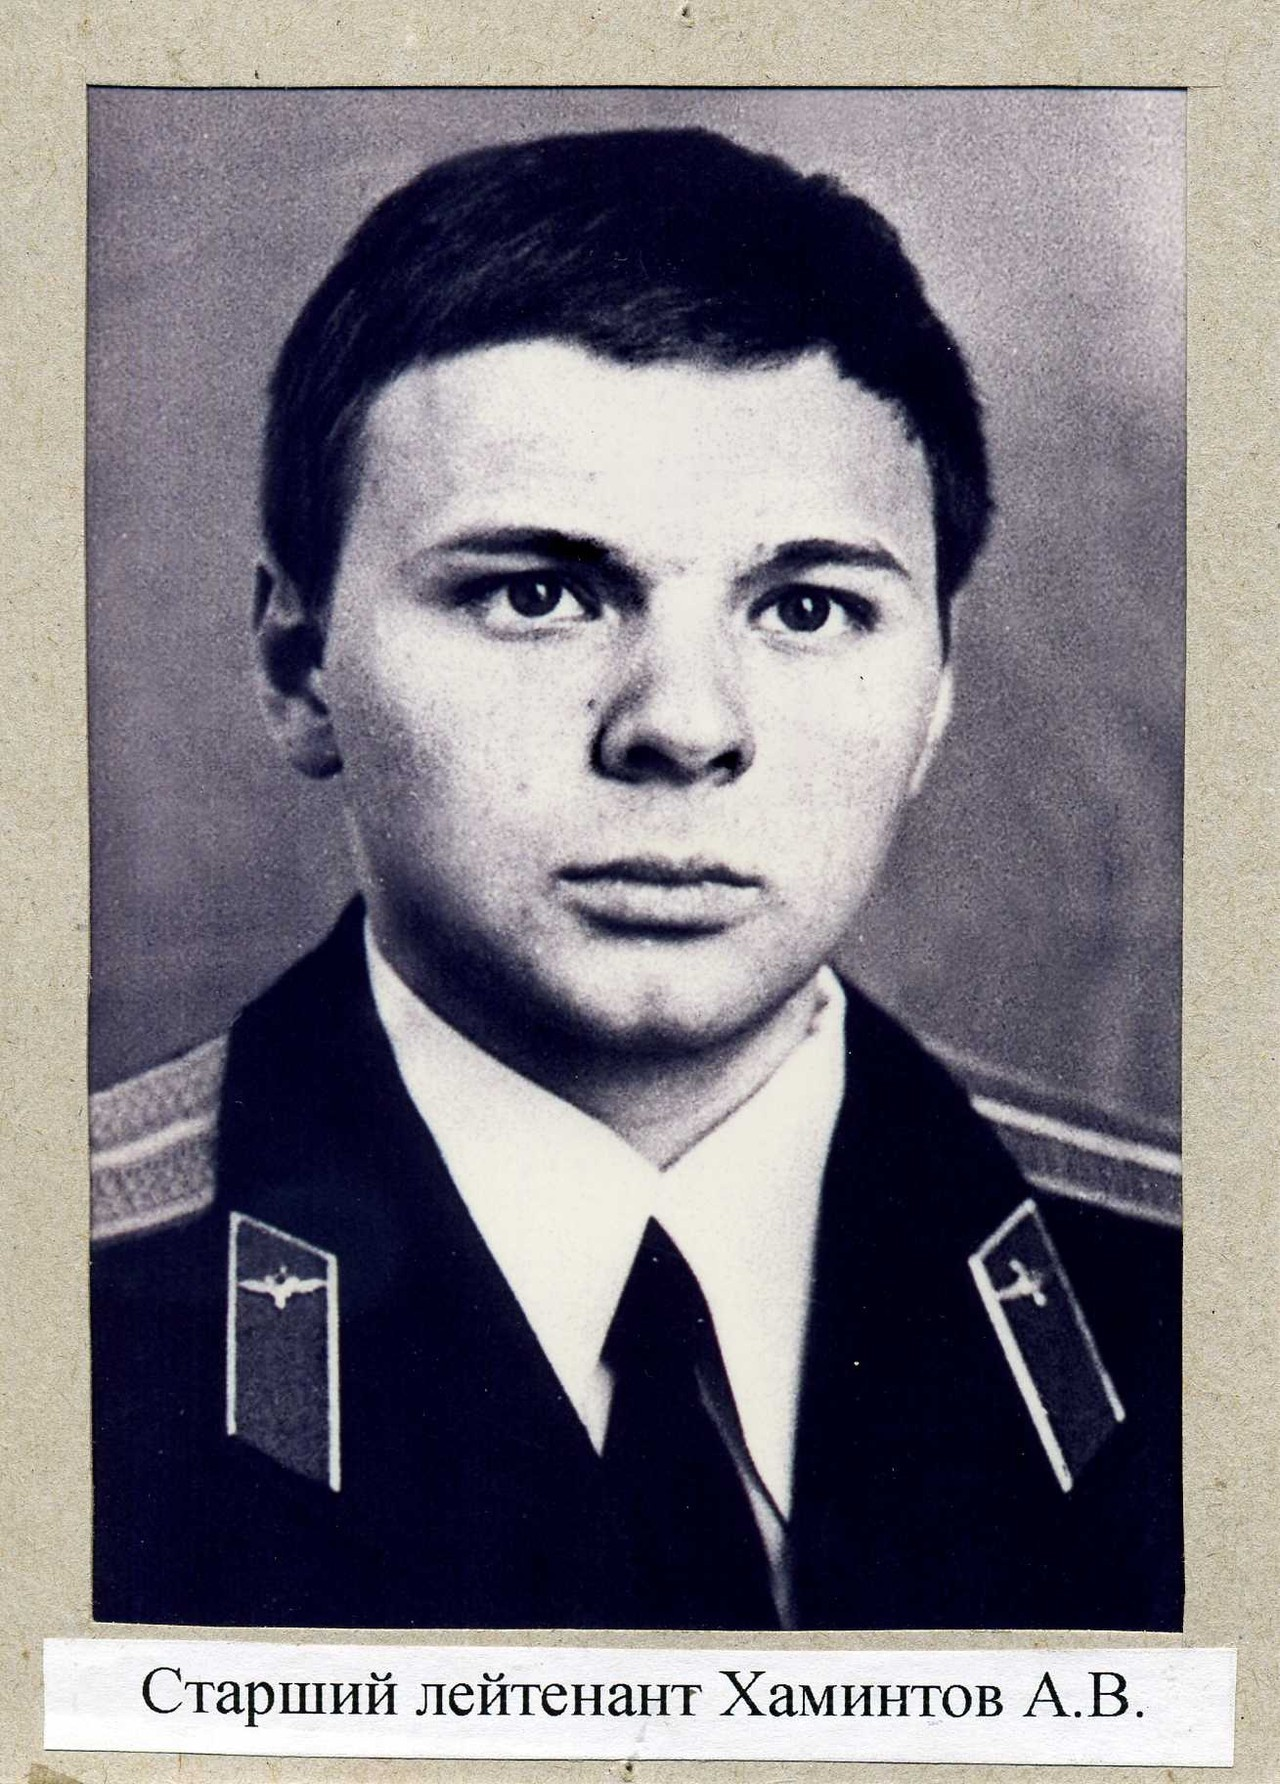 Хаминтов Александр Викторович